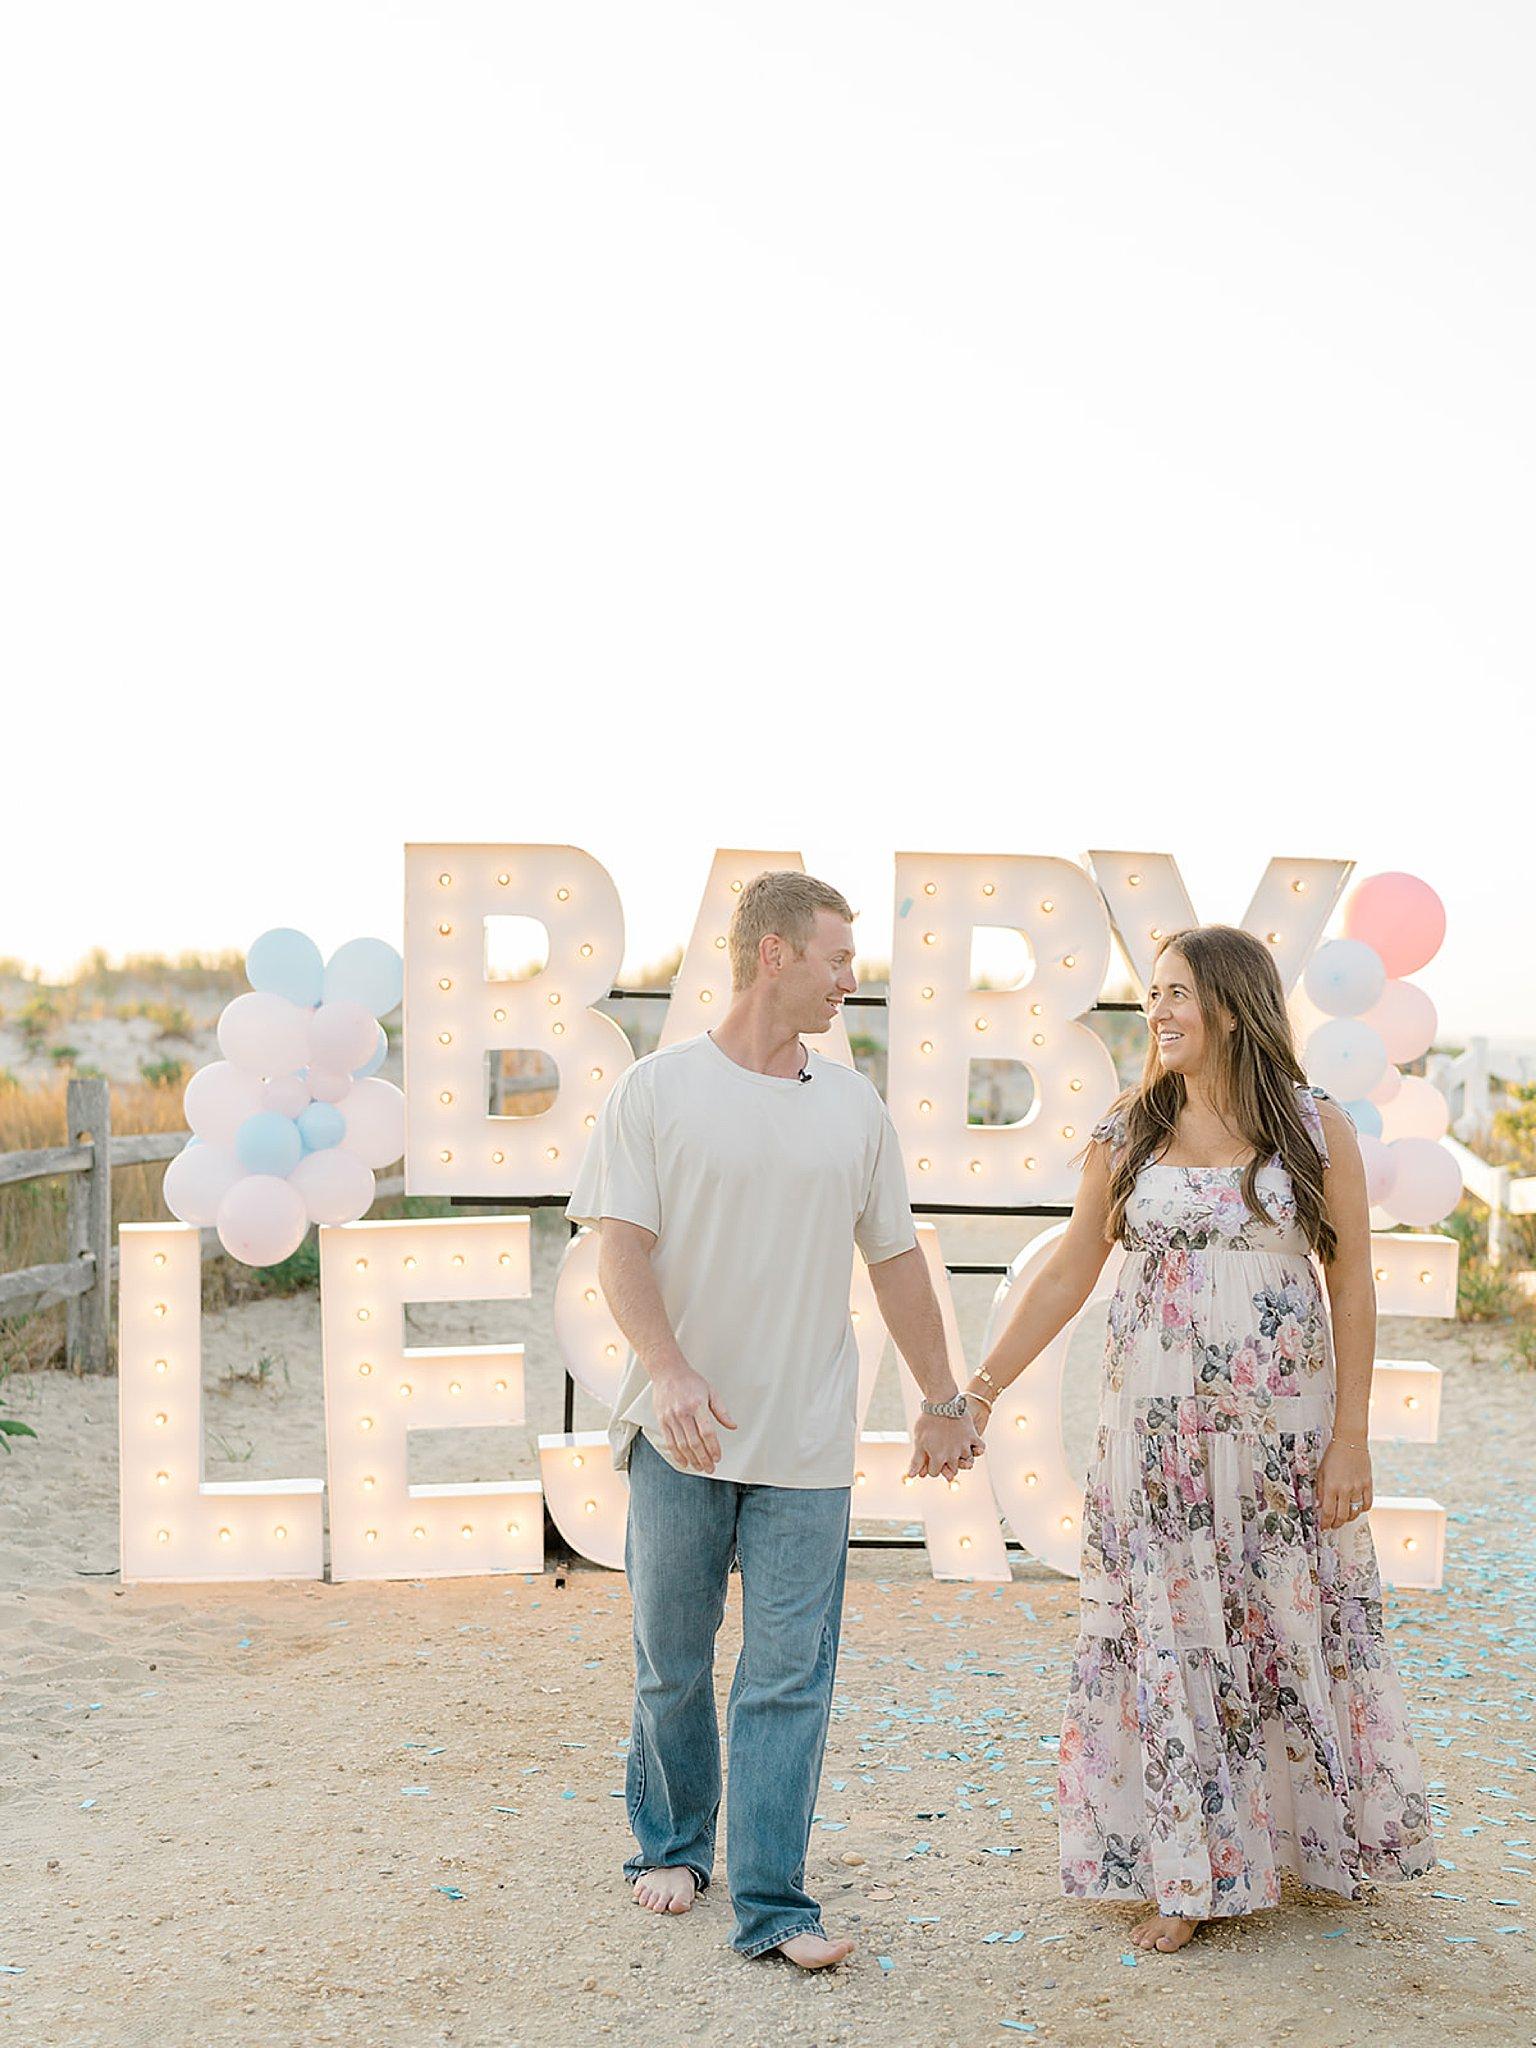 Ocean City NJ Gender Reveal Pregnancy Photography by Magdalena Studios 0012 1